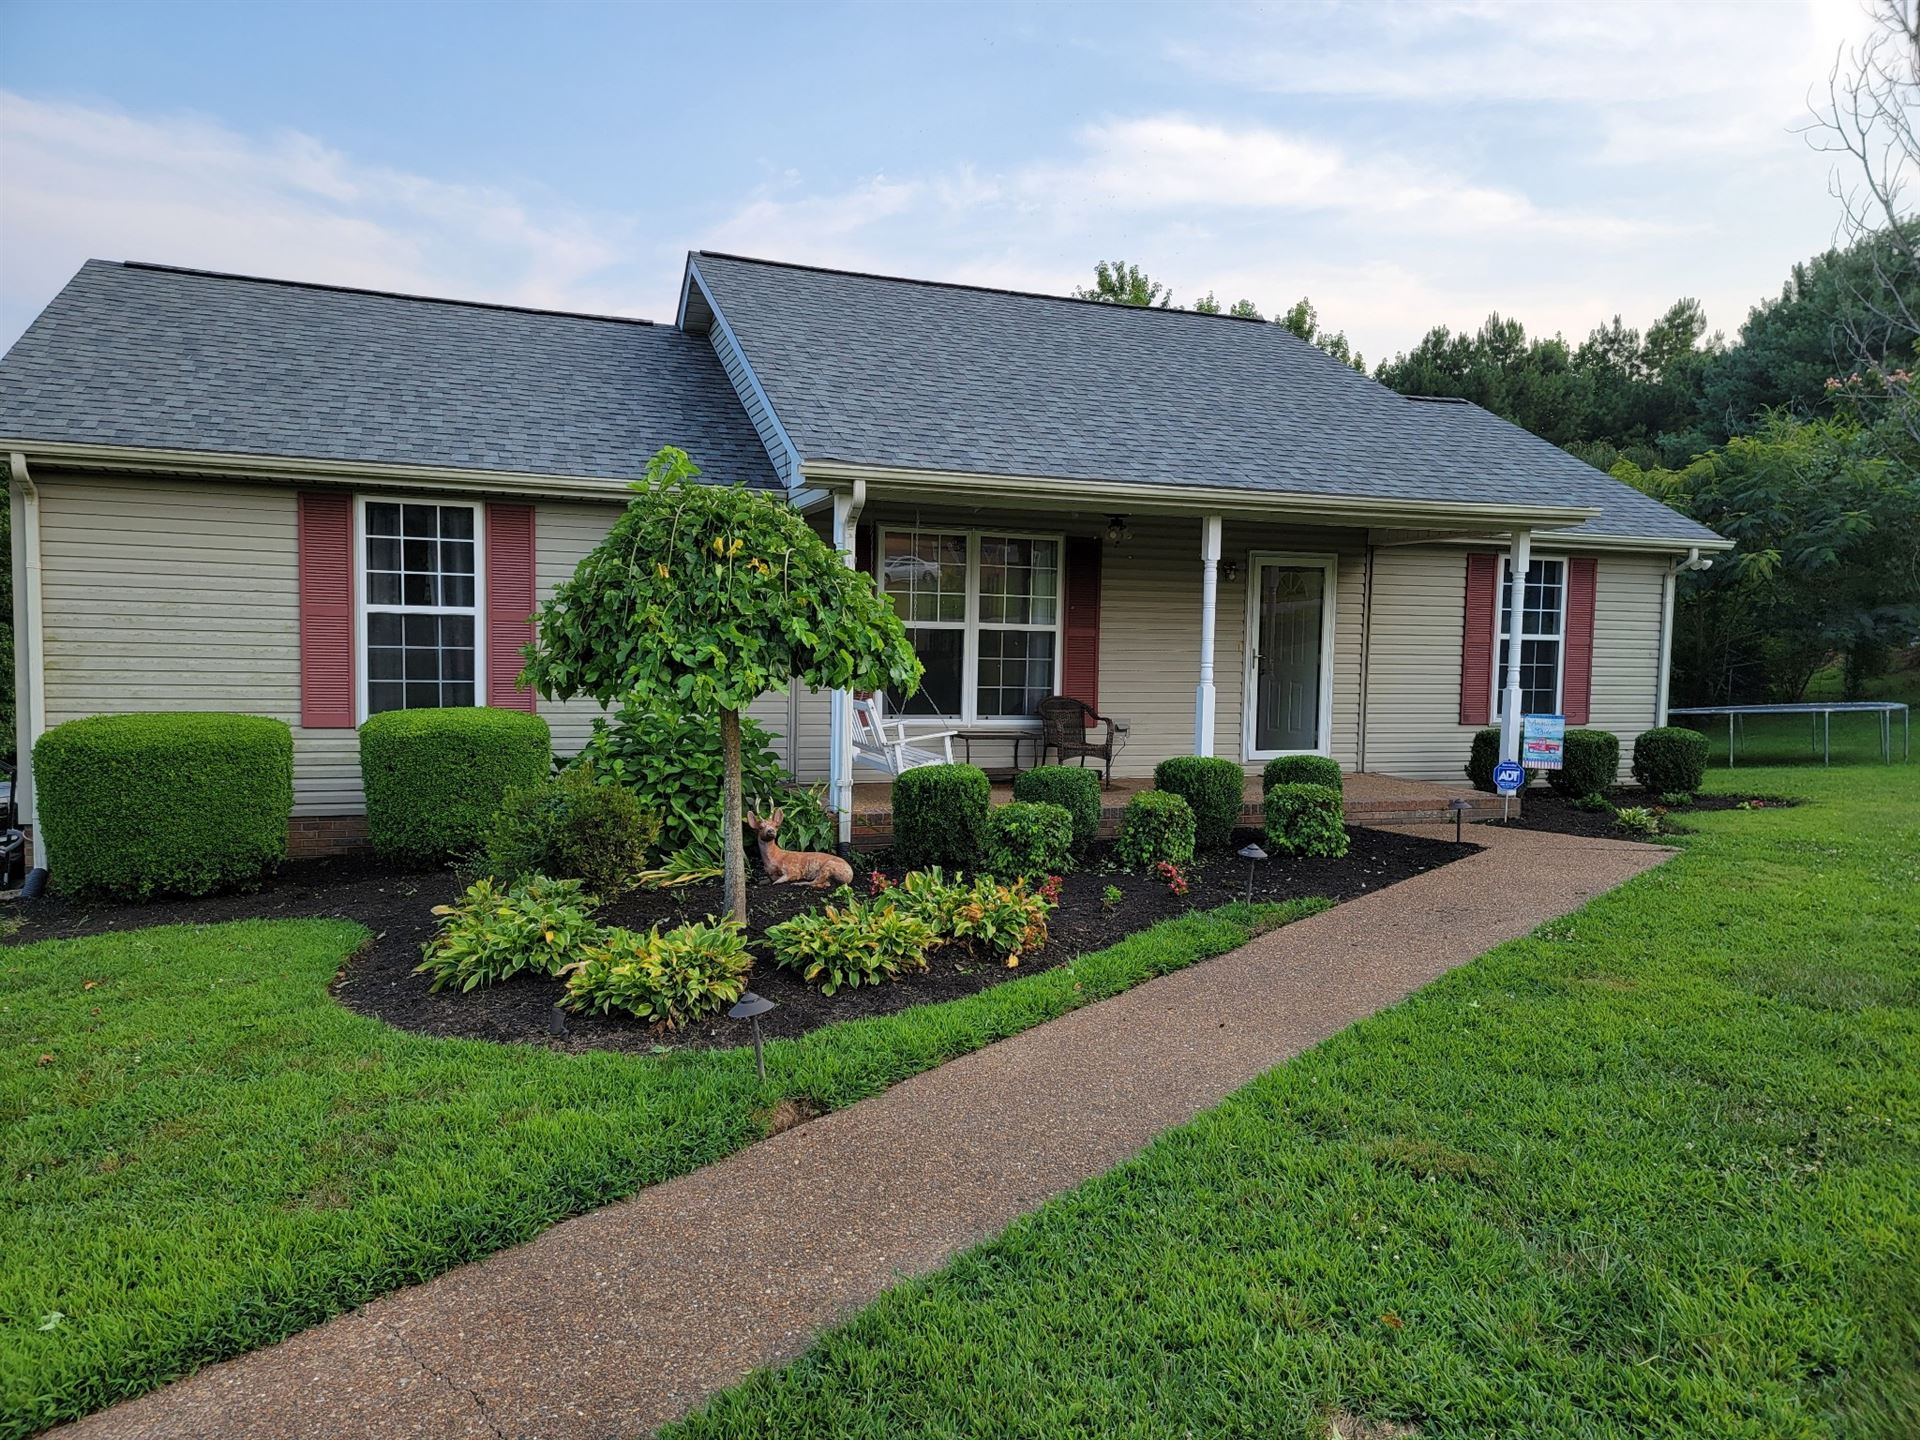 1762 Wynnewood Dr, Chapmansboro, TN 37035 - MLS#: 2276911